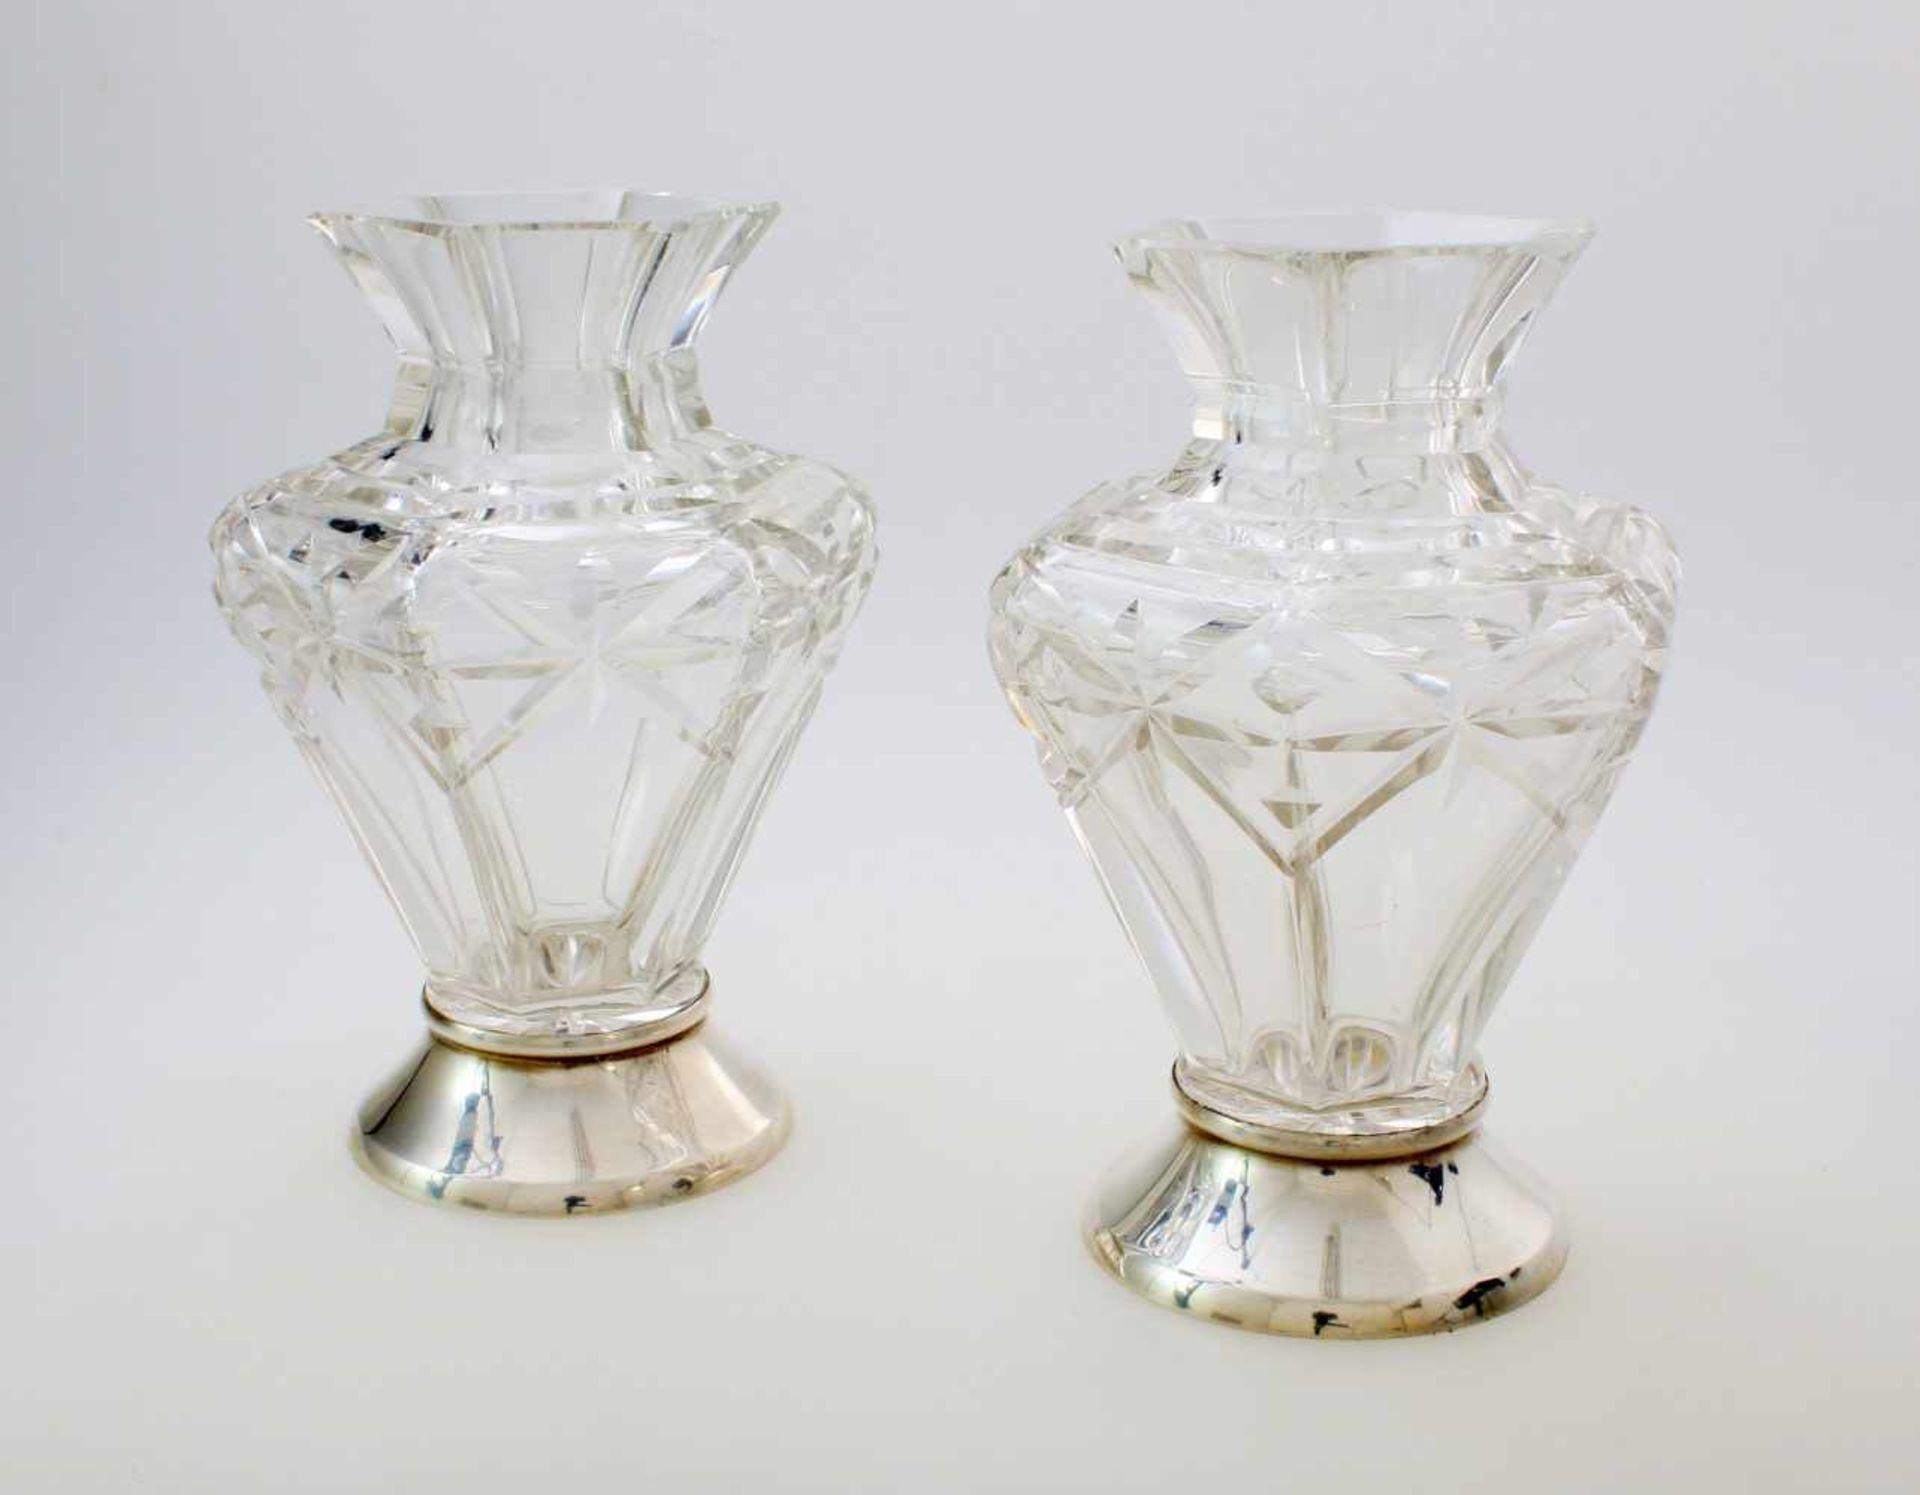 Kristallvasenpaar mit SilberfußFarbloses Kristallglas, ornamental geschnitten, sechseckiger